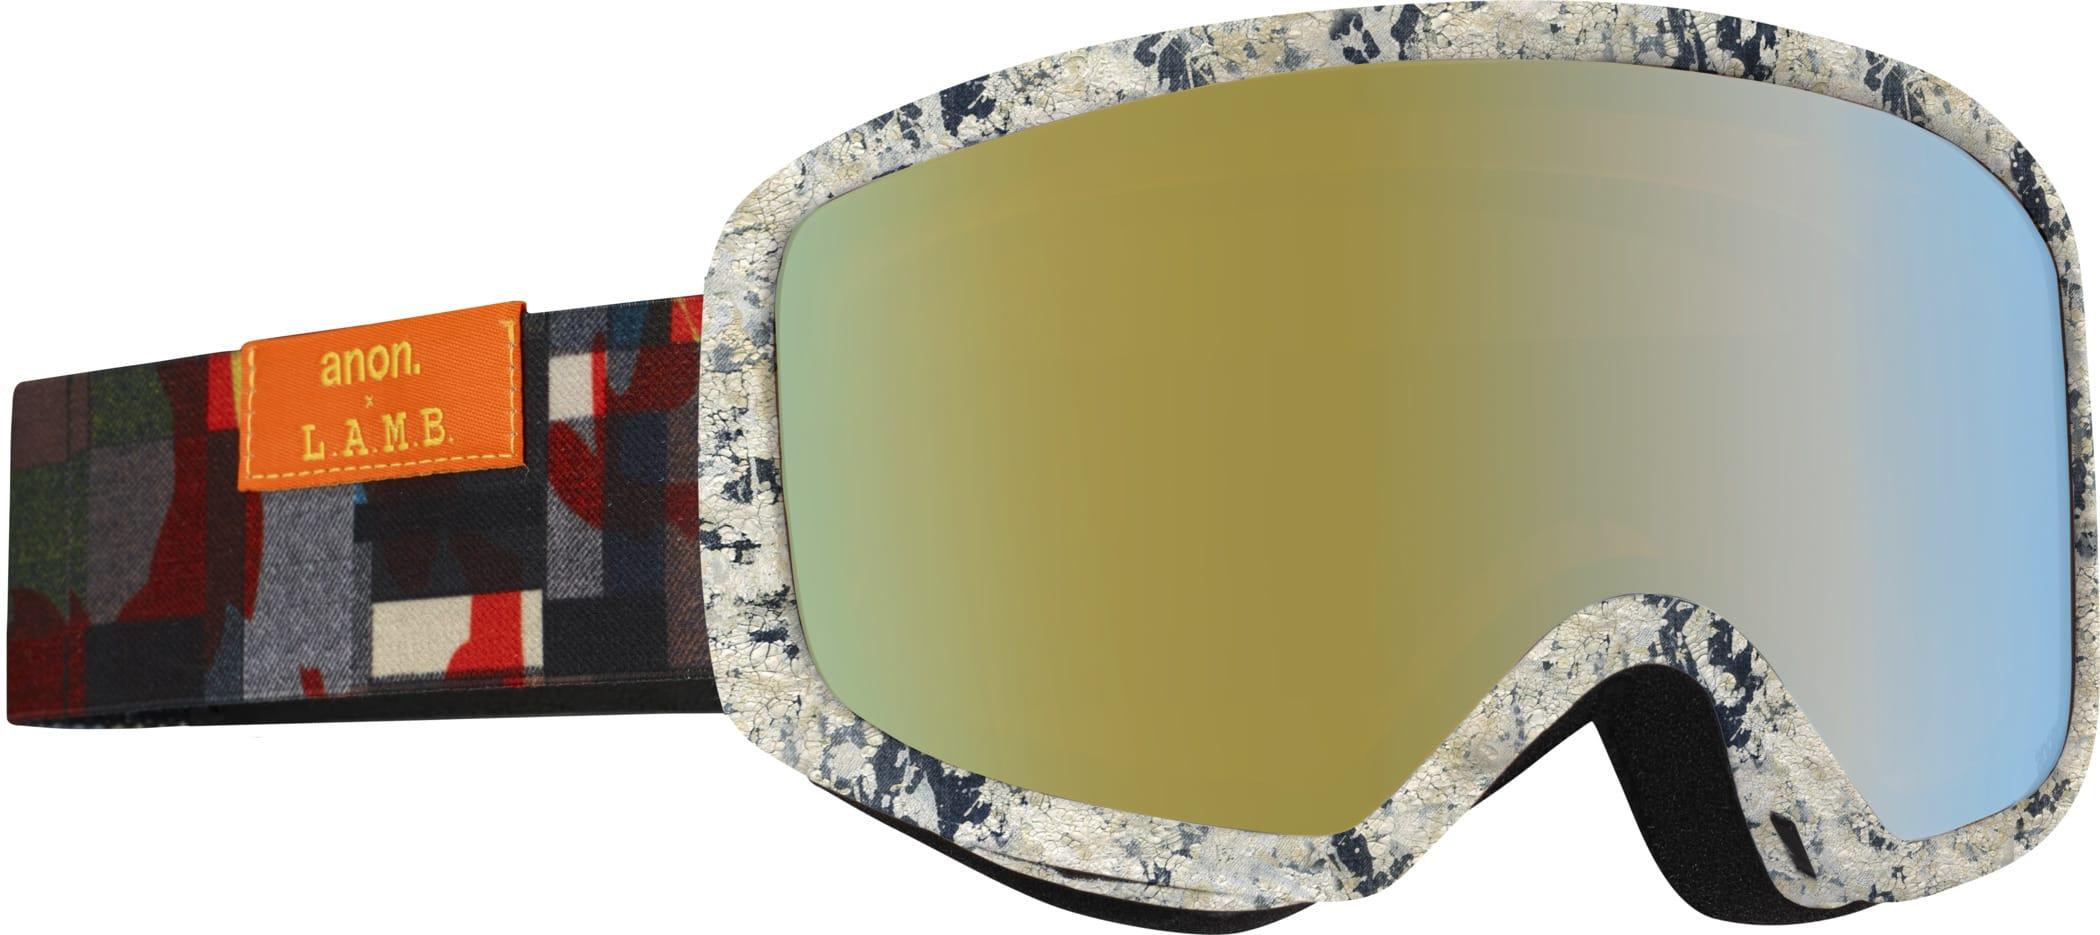 Anon Deringer MFI Second Goggles - thumbnail 1 9fc533ece3b12